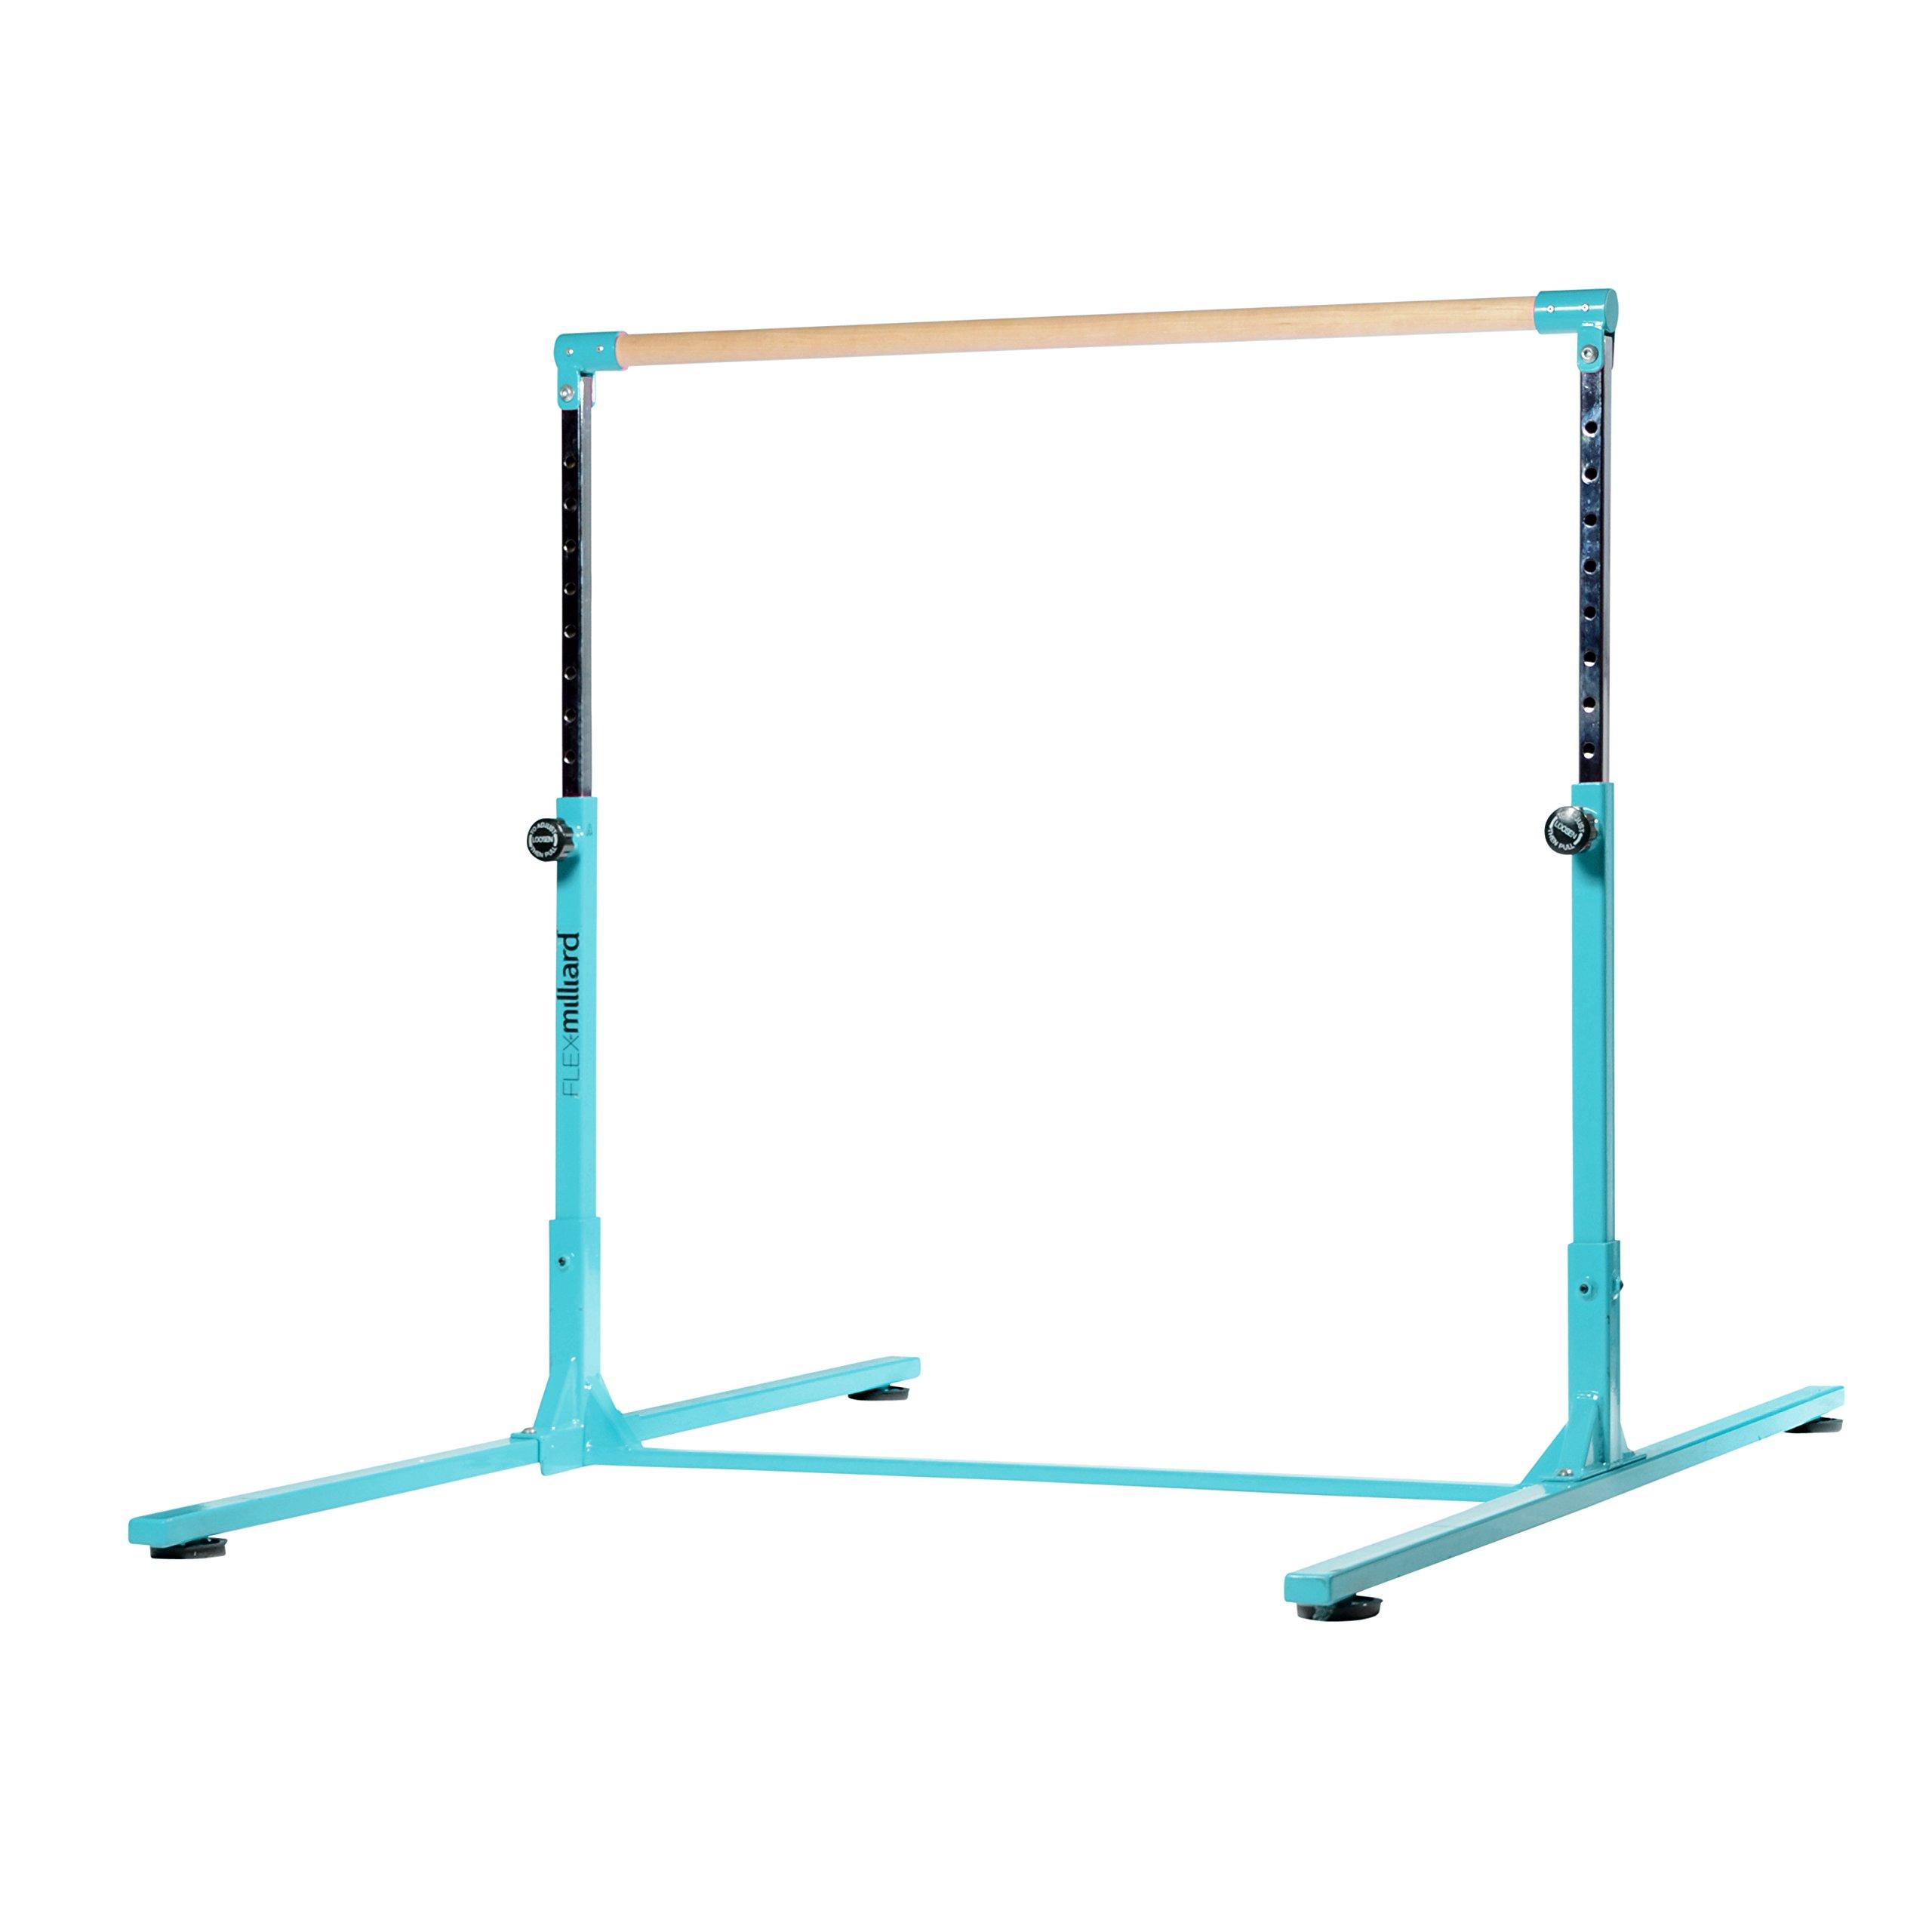 Amazon.com : Milliard Professional Gymnastics Kip Bar Height Adjustable, Bright Teal : Sports & Outdoors